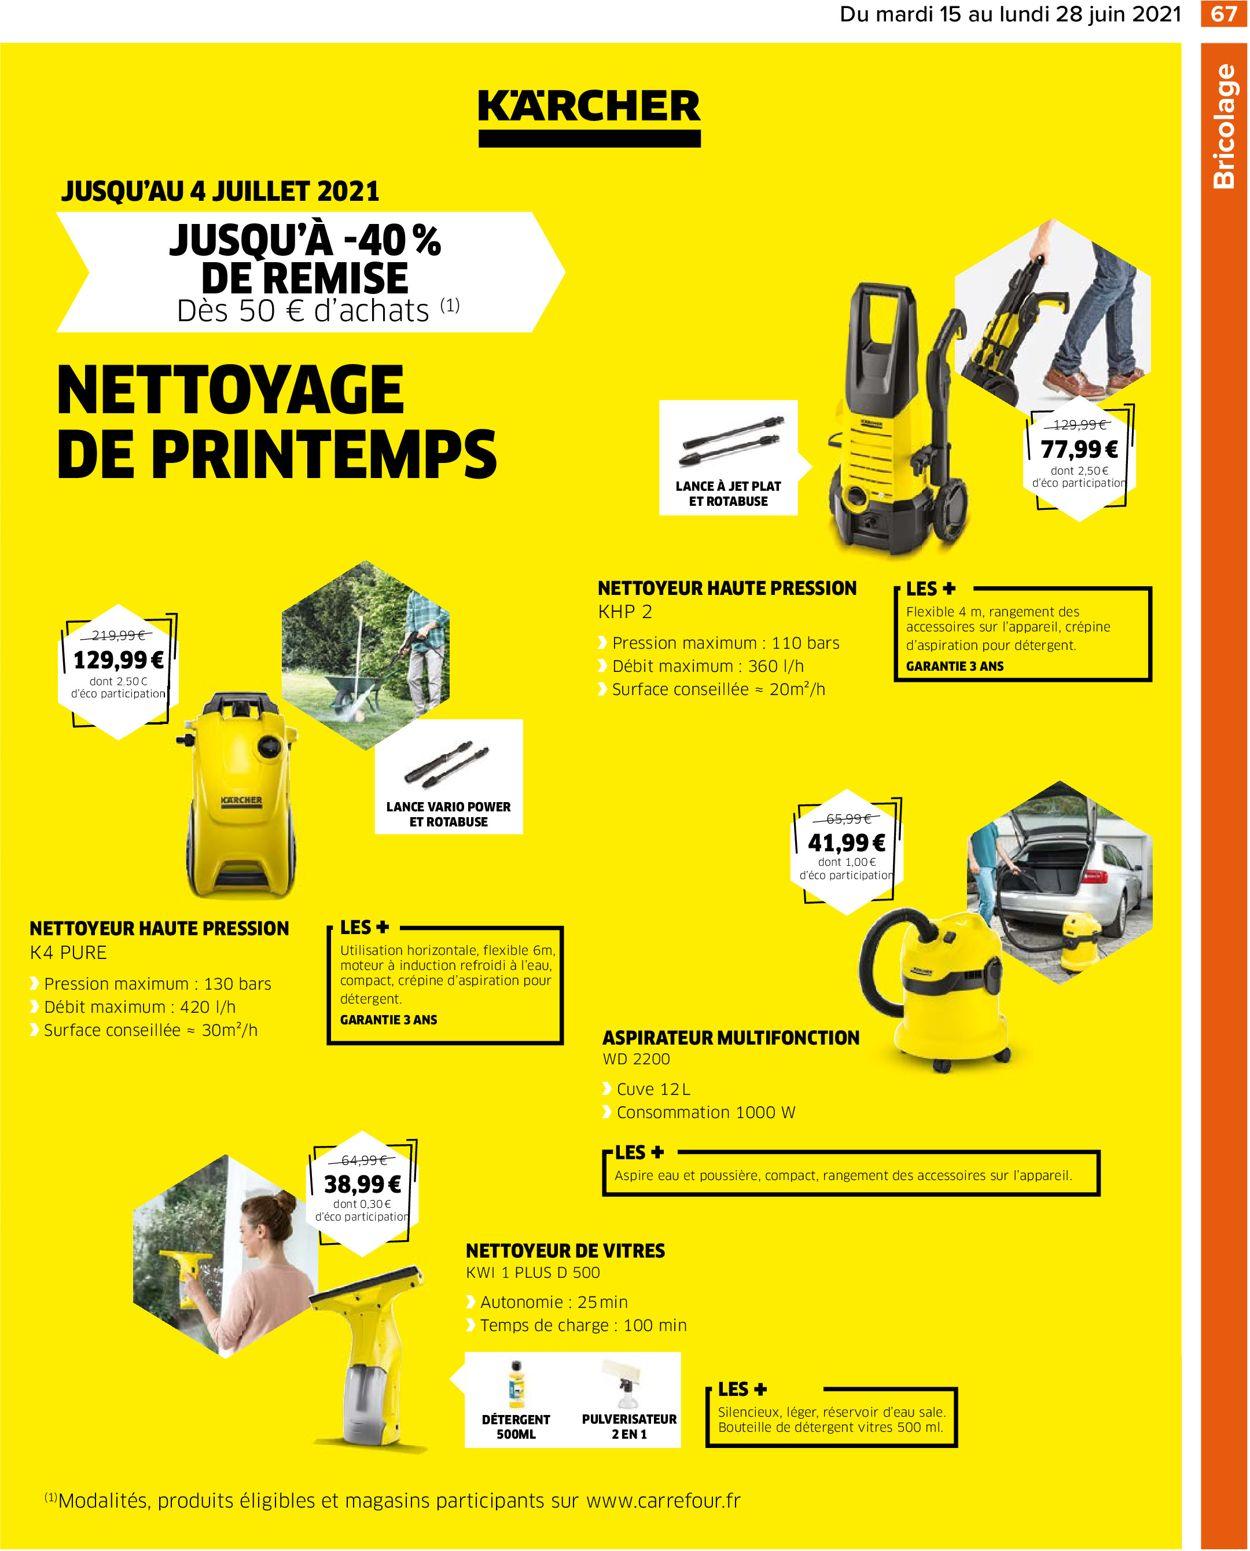 Carrefour Catalogue - 15.06-28.06.2021 (Page 72)